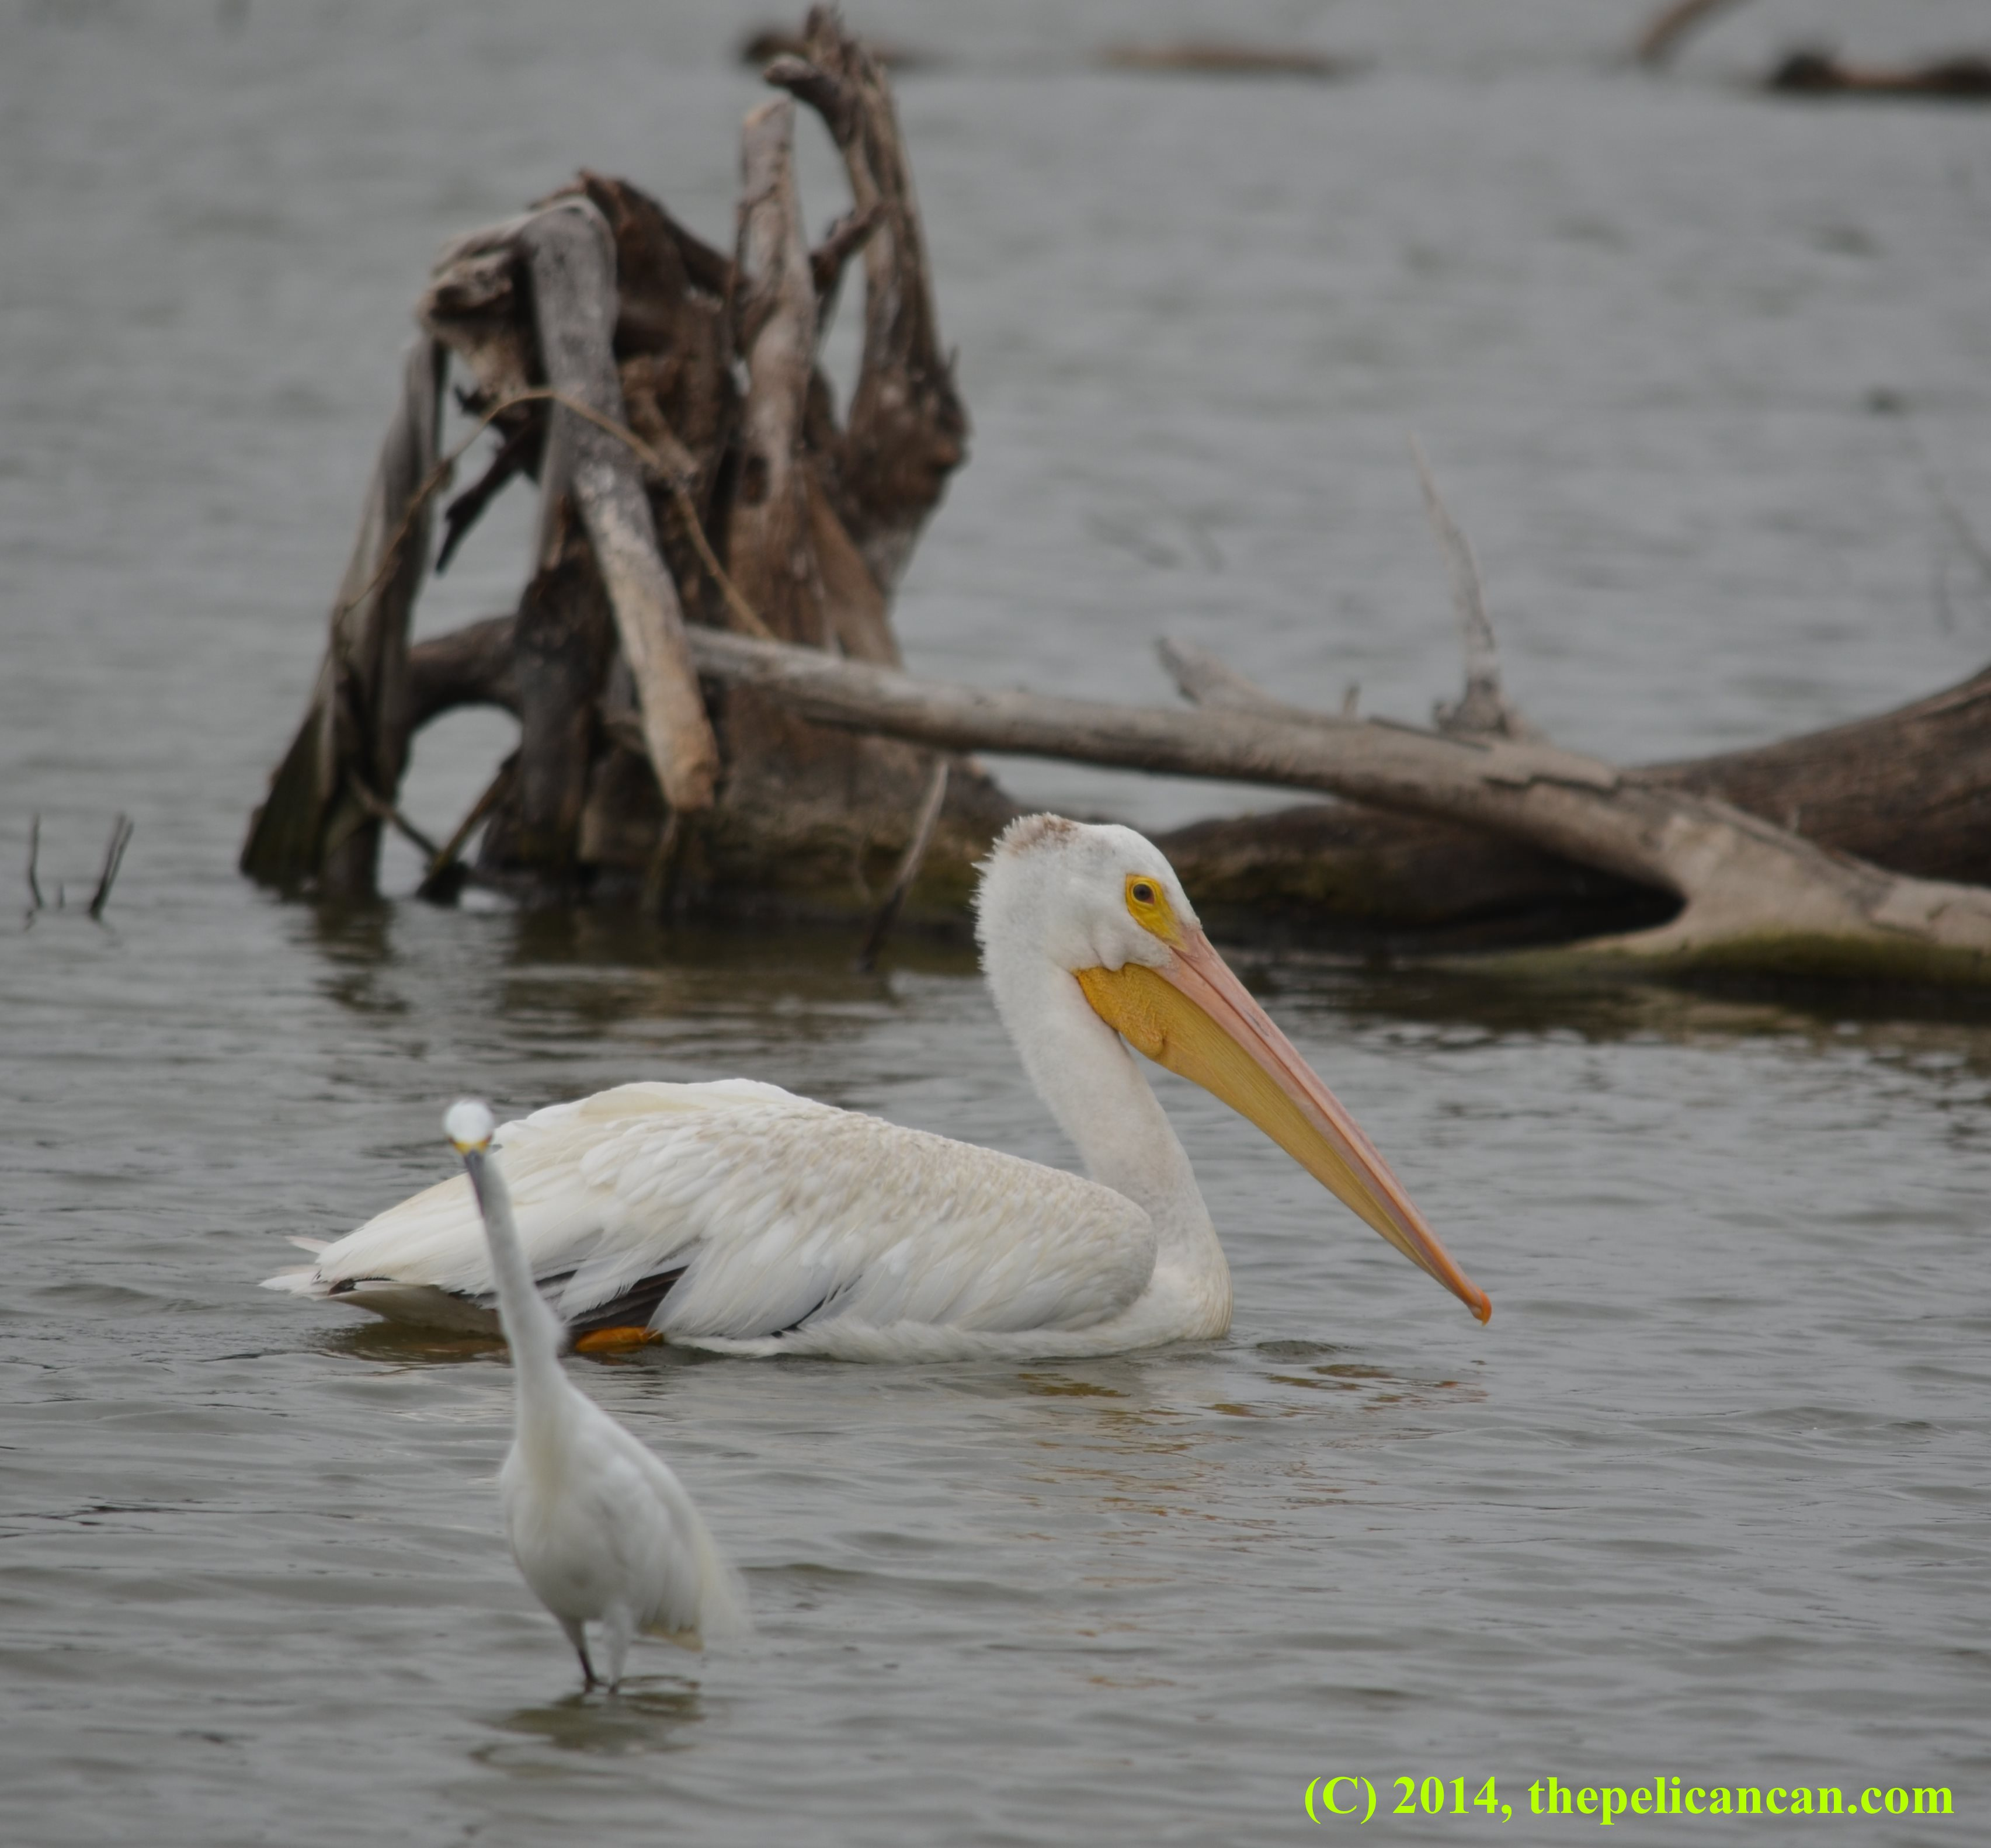 Pelicans Pelecanus Erythrorhynchos: American White Pelican